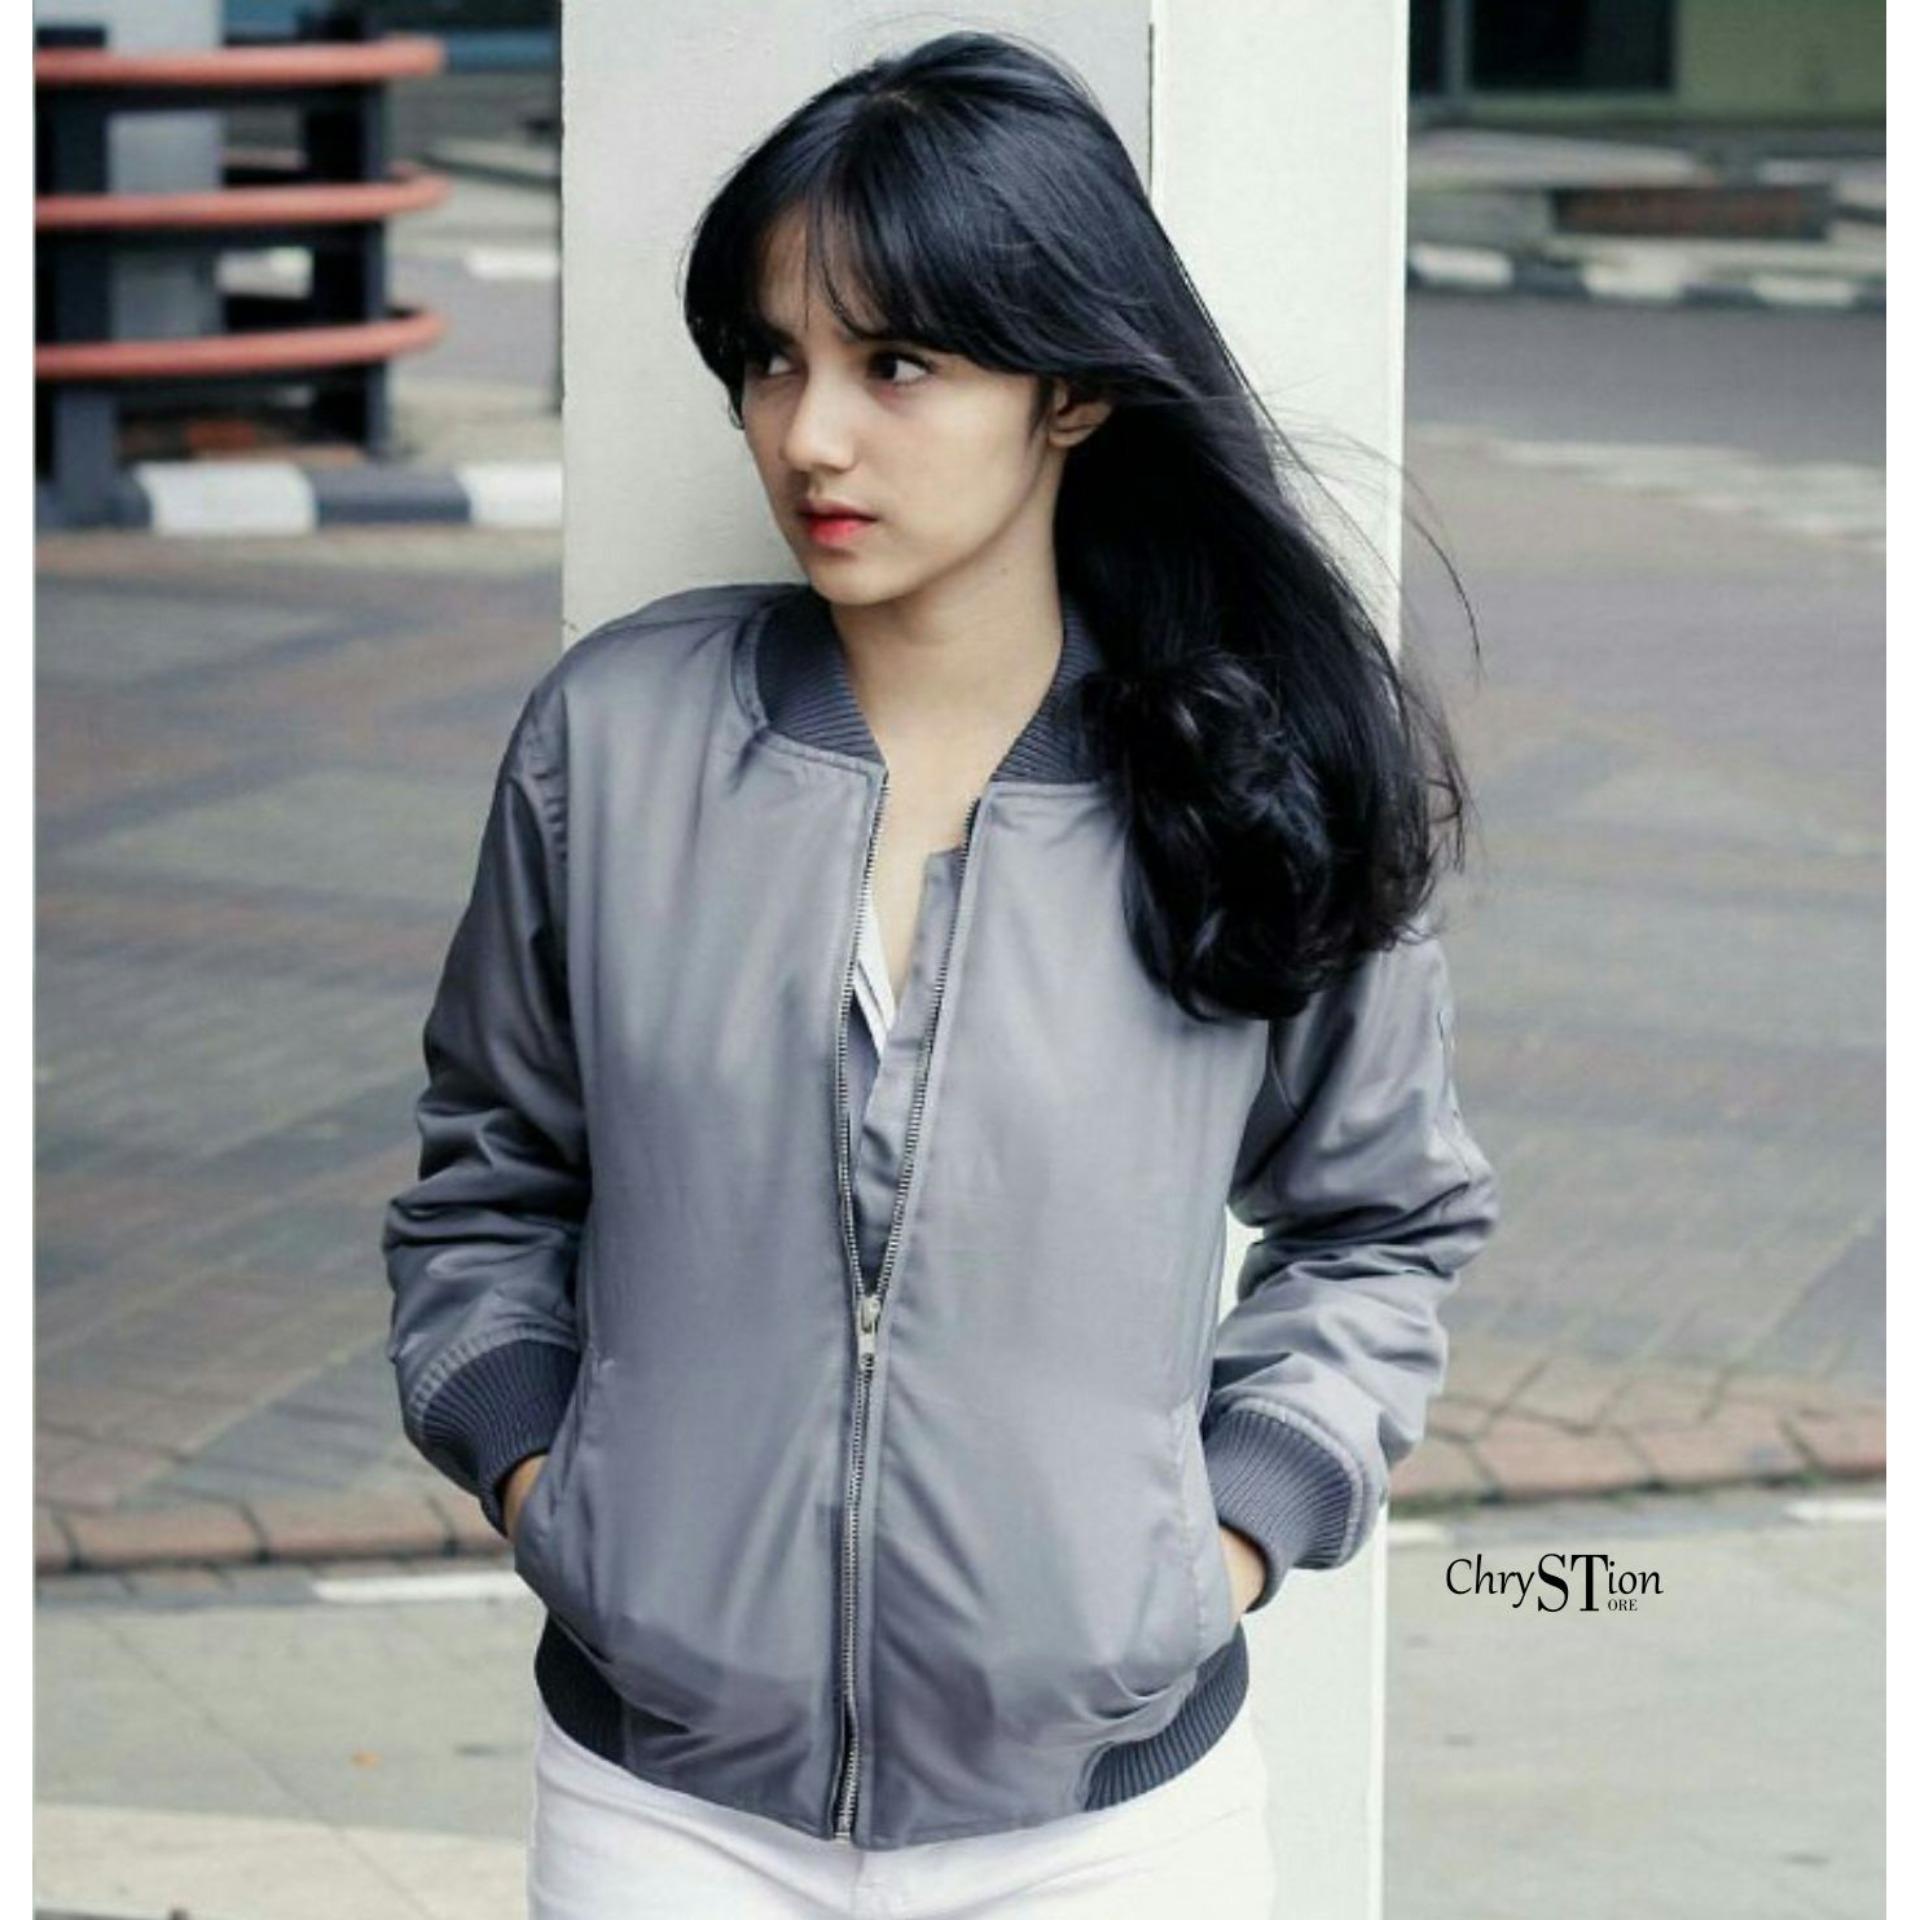 Chrystion Bomber Jacket Wanita Parasut Tebal Lengan Panjang Rip Premium